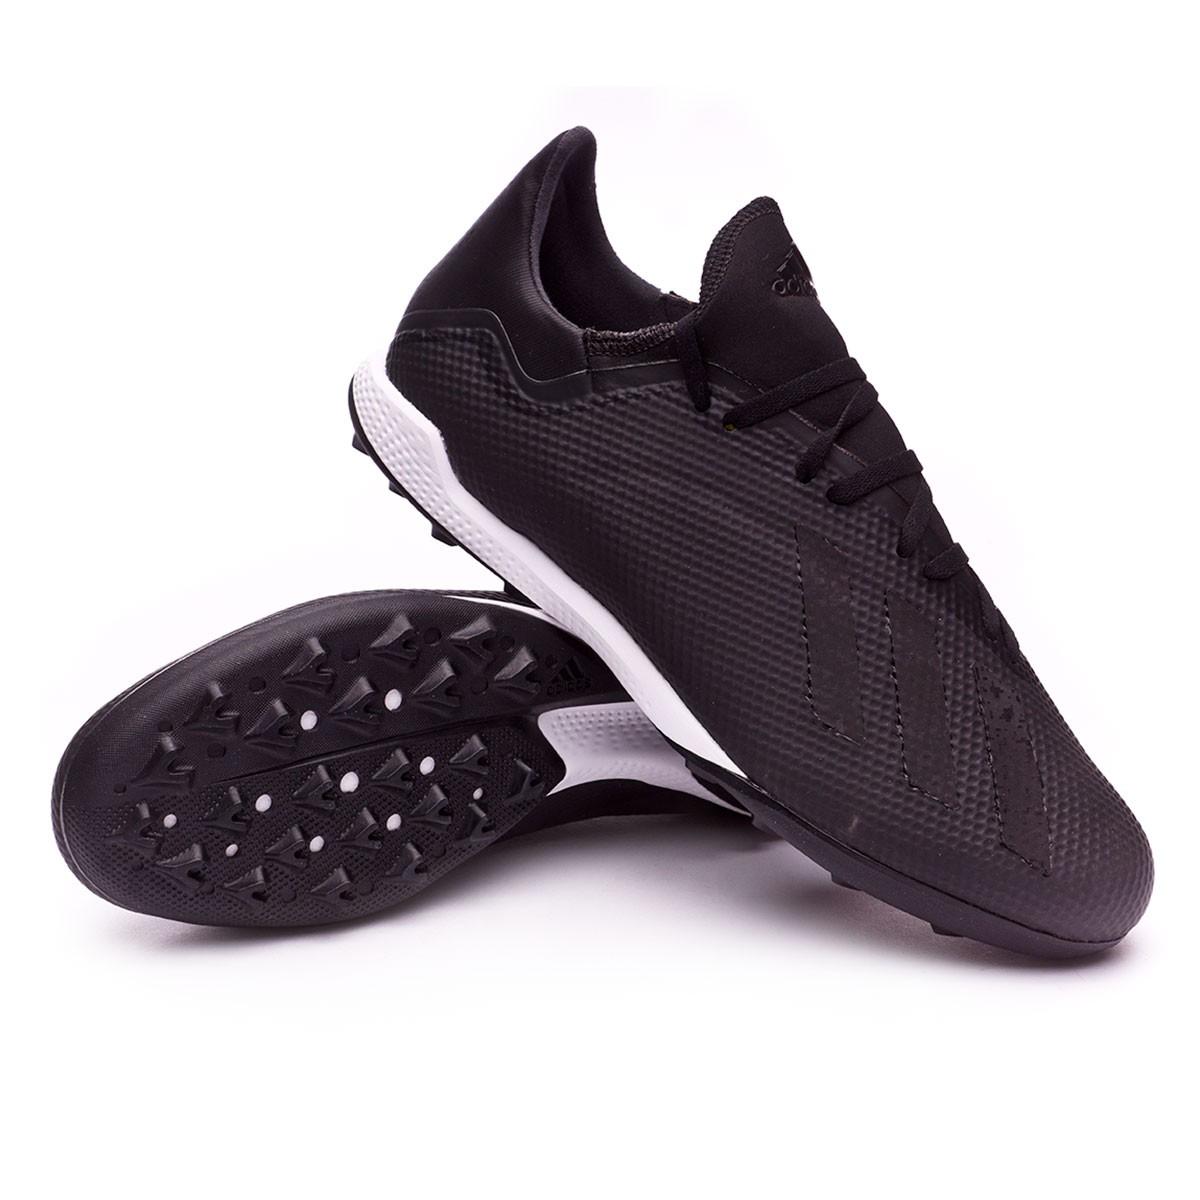 2e7b42e8c Football Boot adidas X Tango 18.3 Turf Core black-White - Tienda de ...